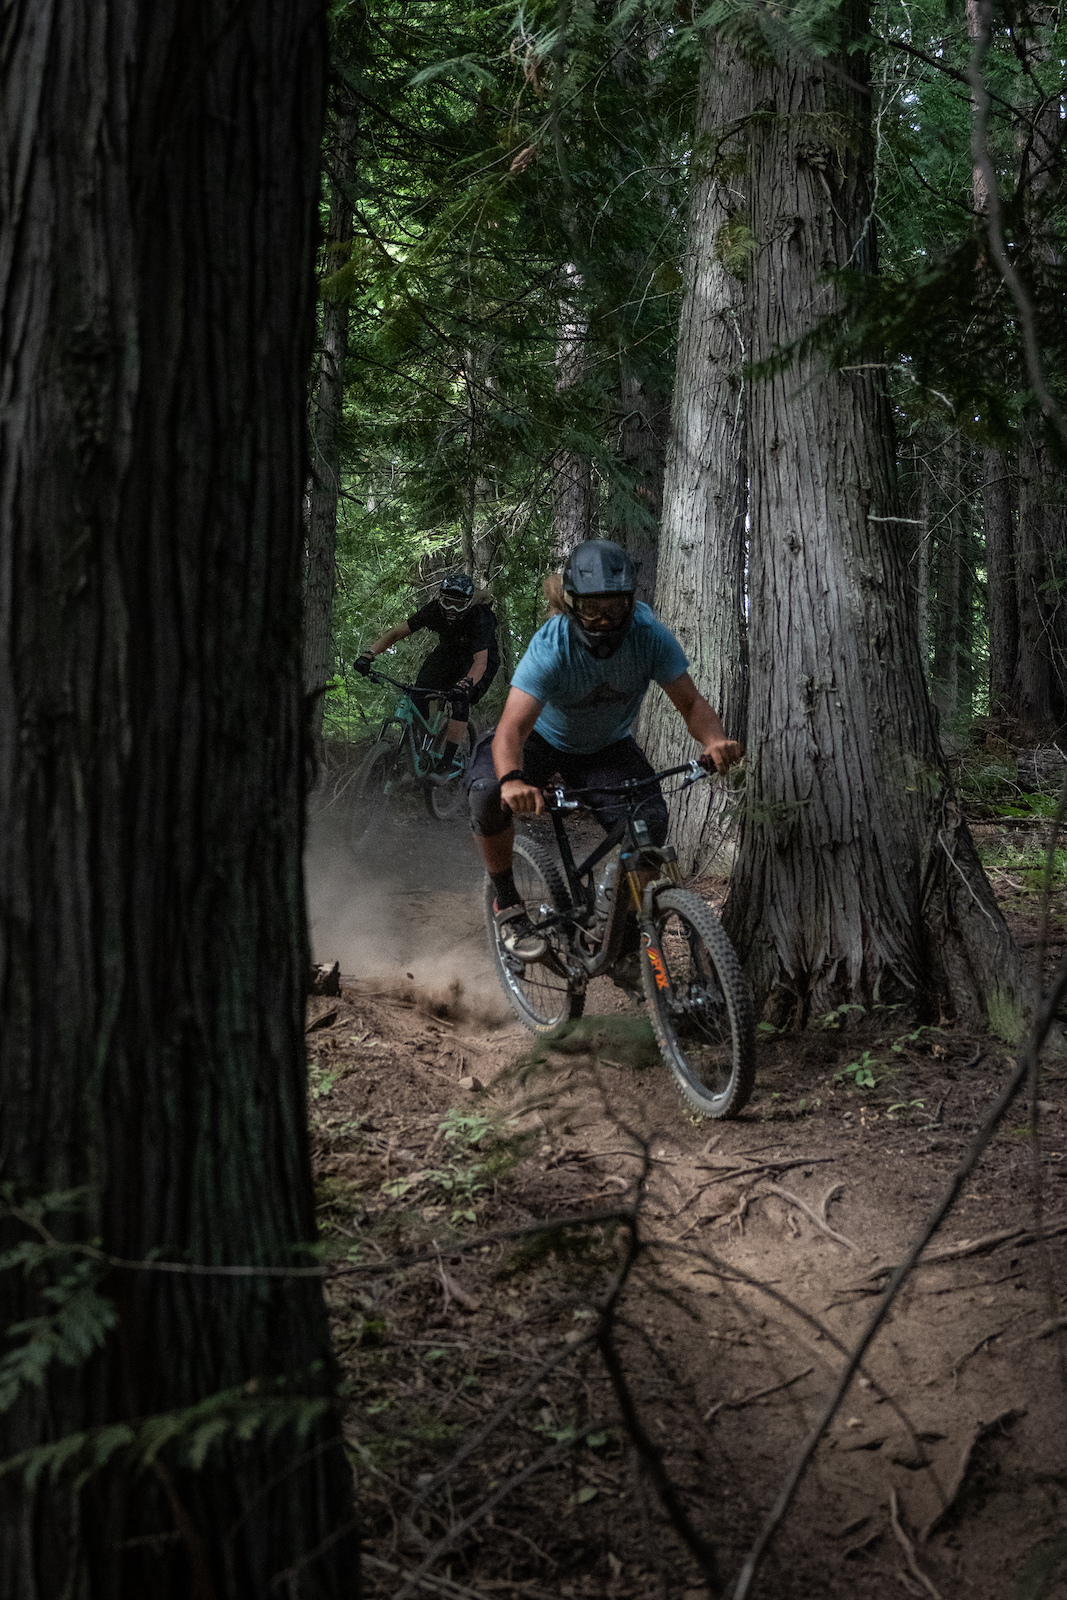 The cedar slalom course